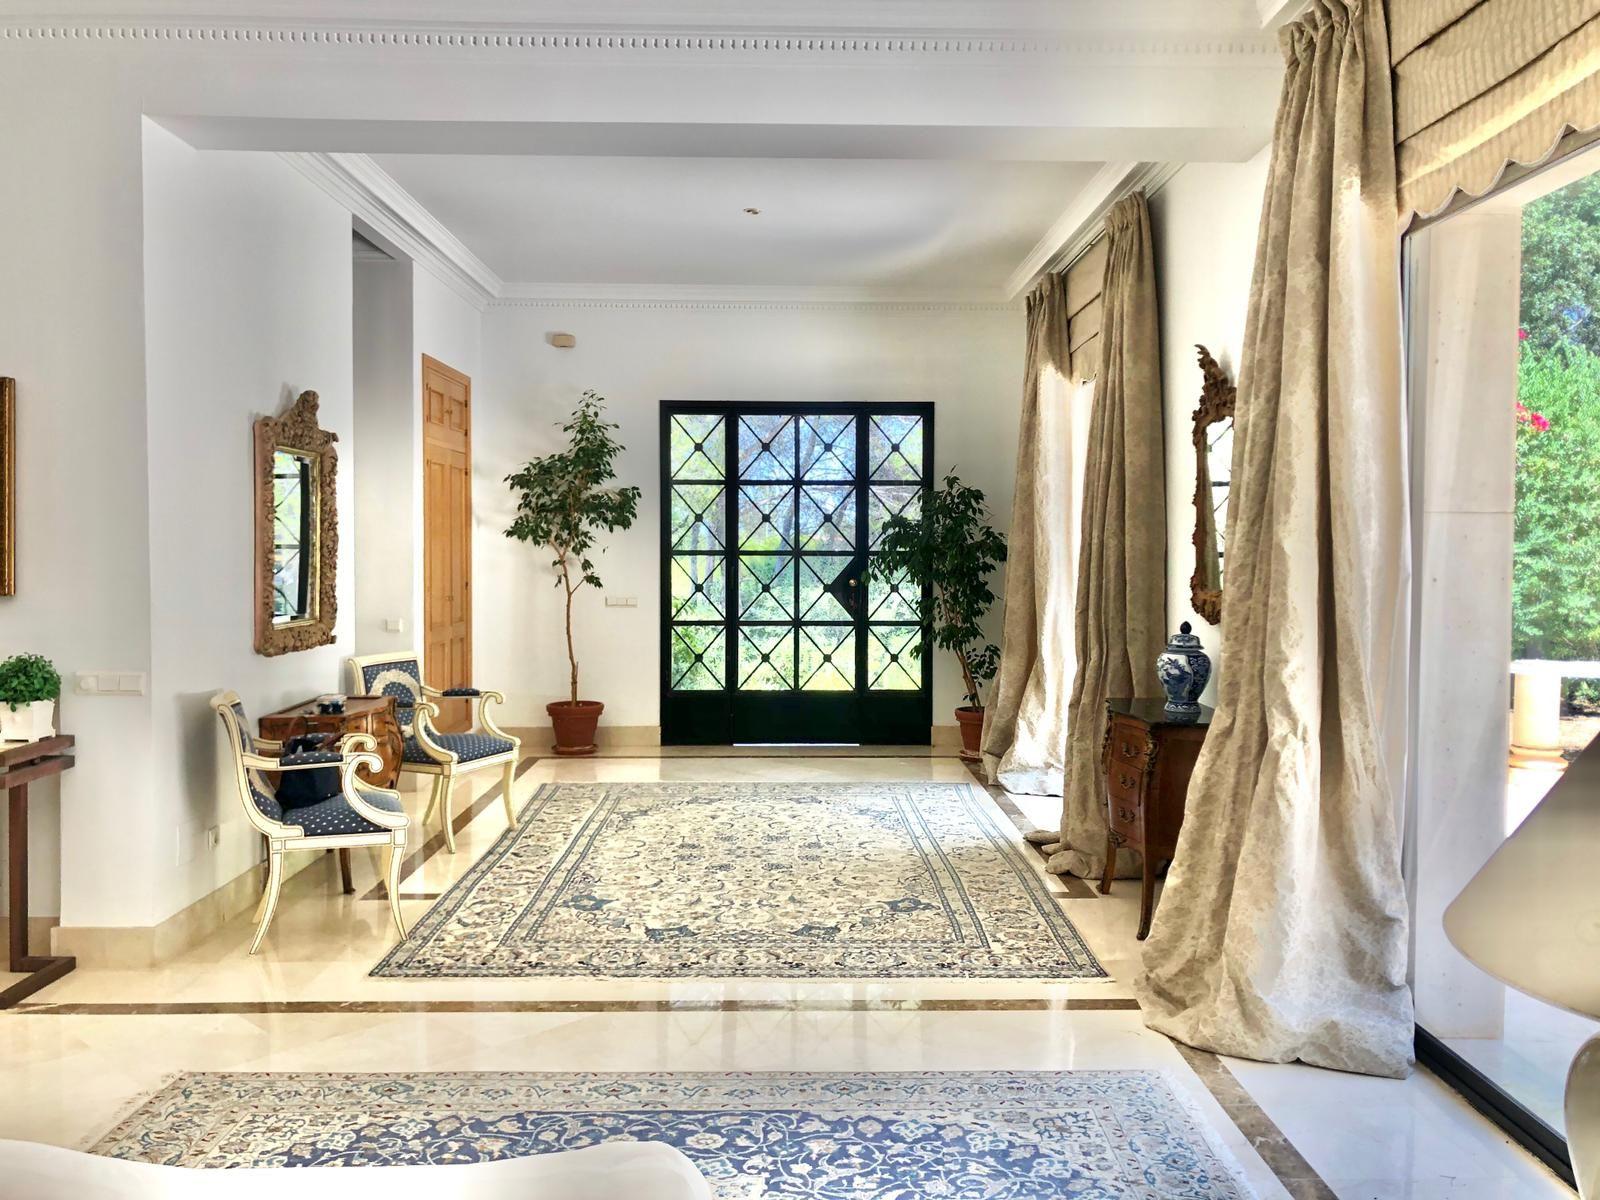 Villa de Lujo en Palma, Son Vida, alquiler